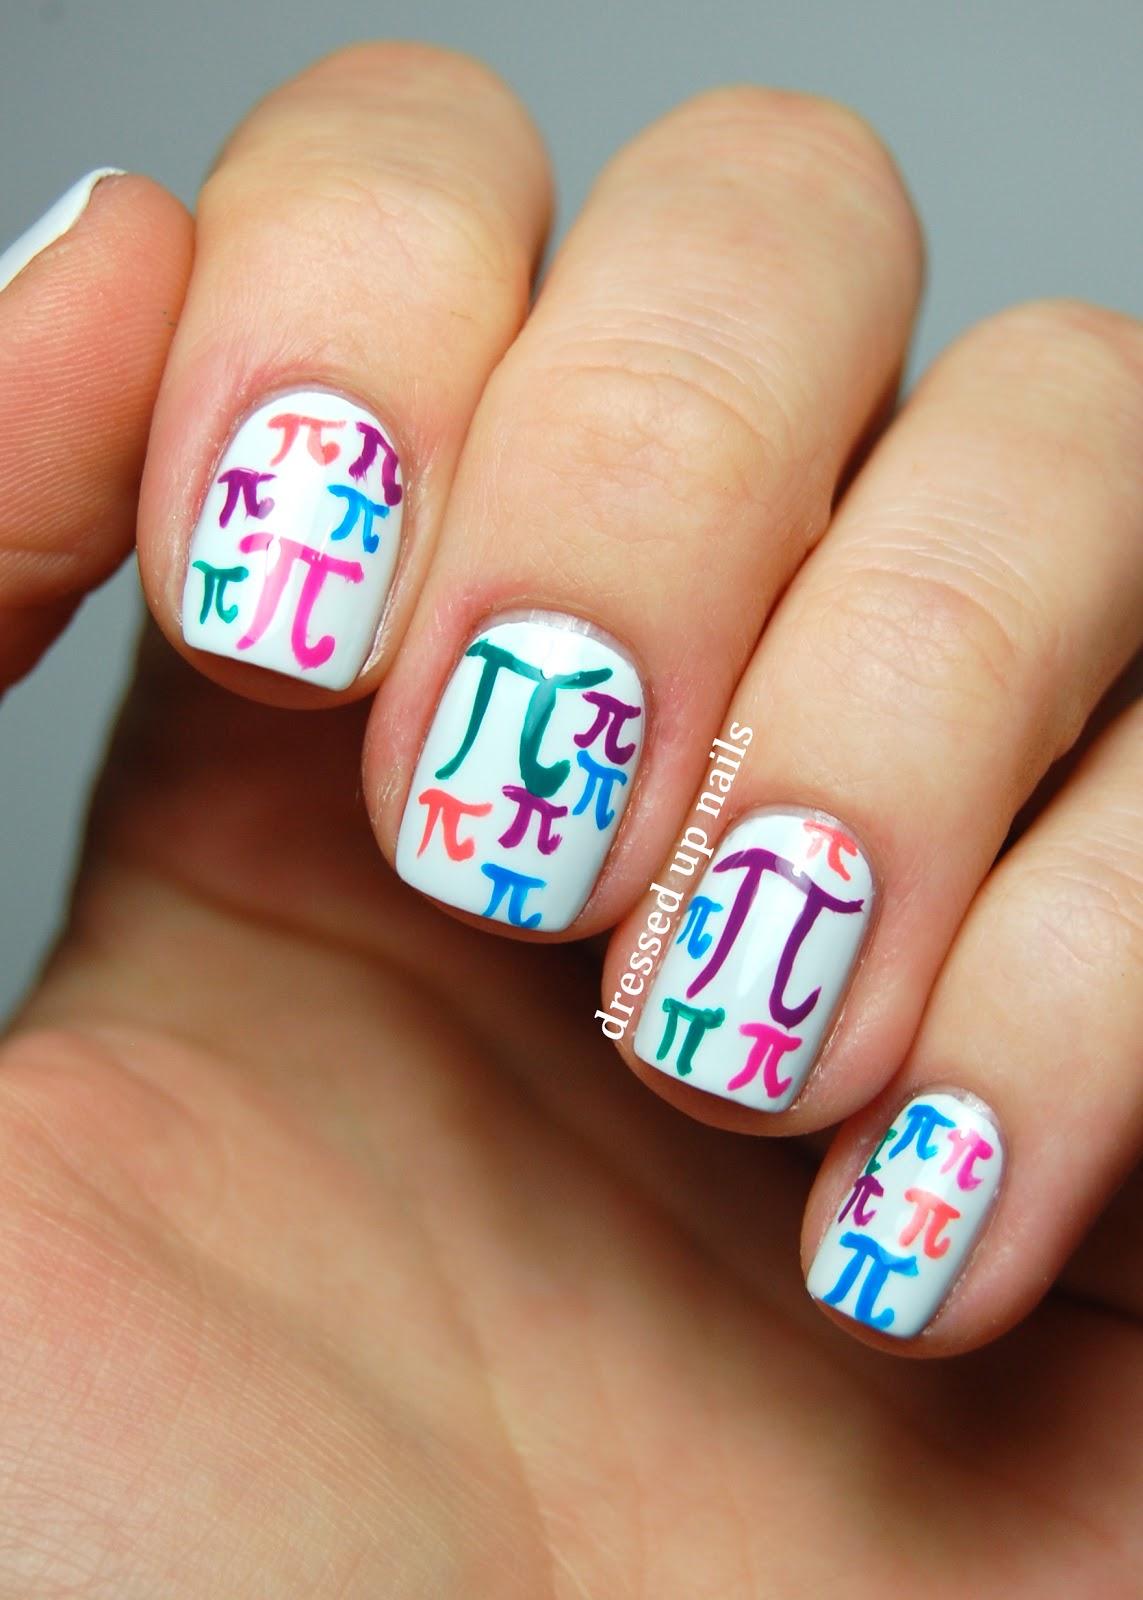 Modele unghii false colorate